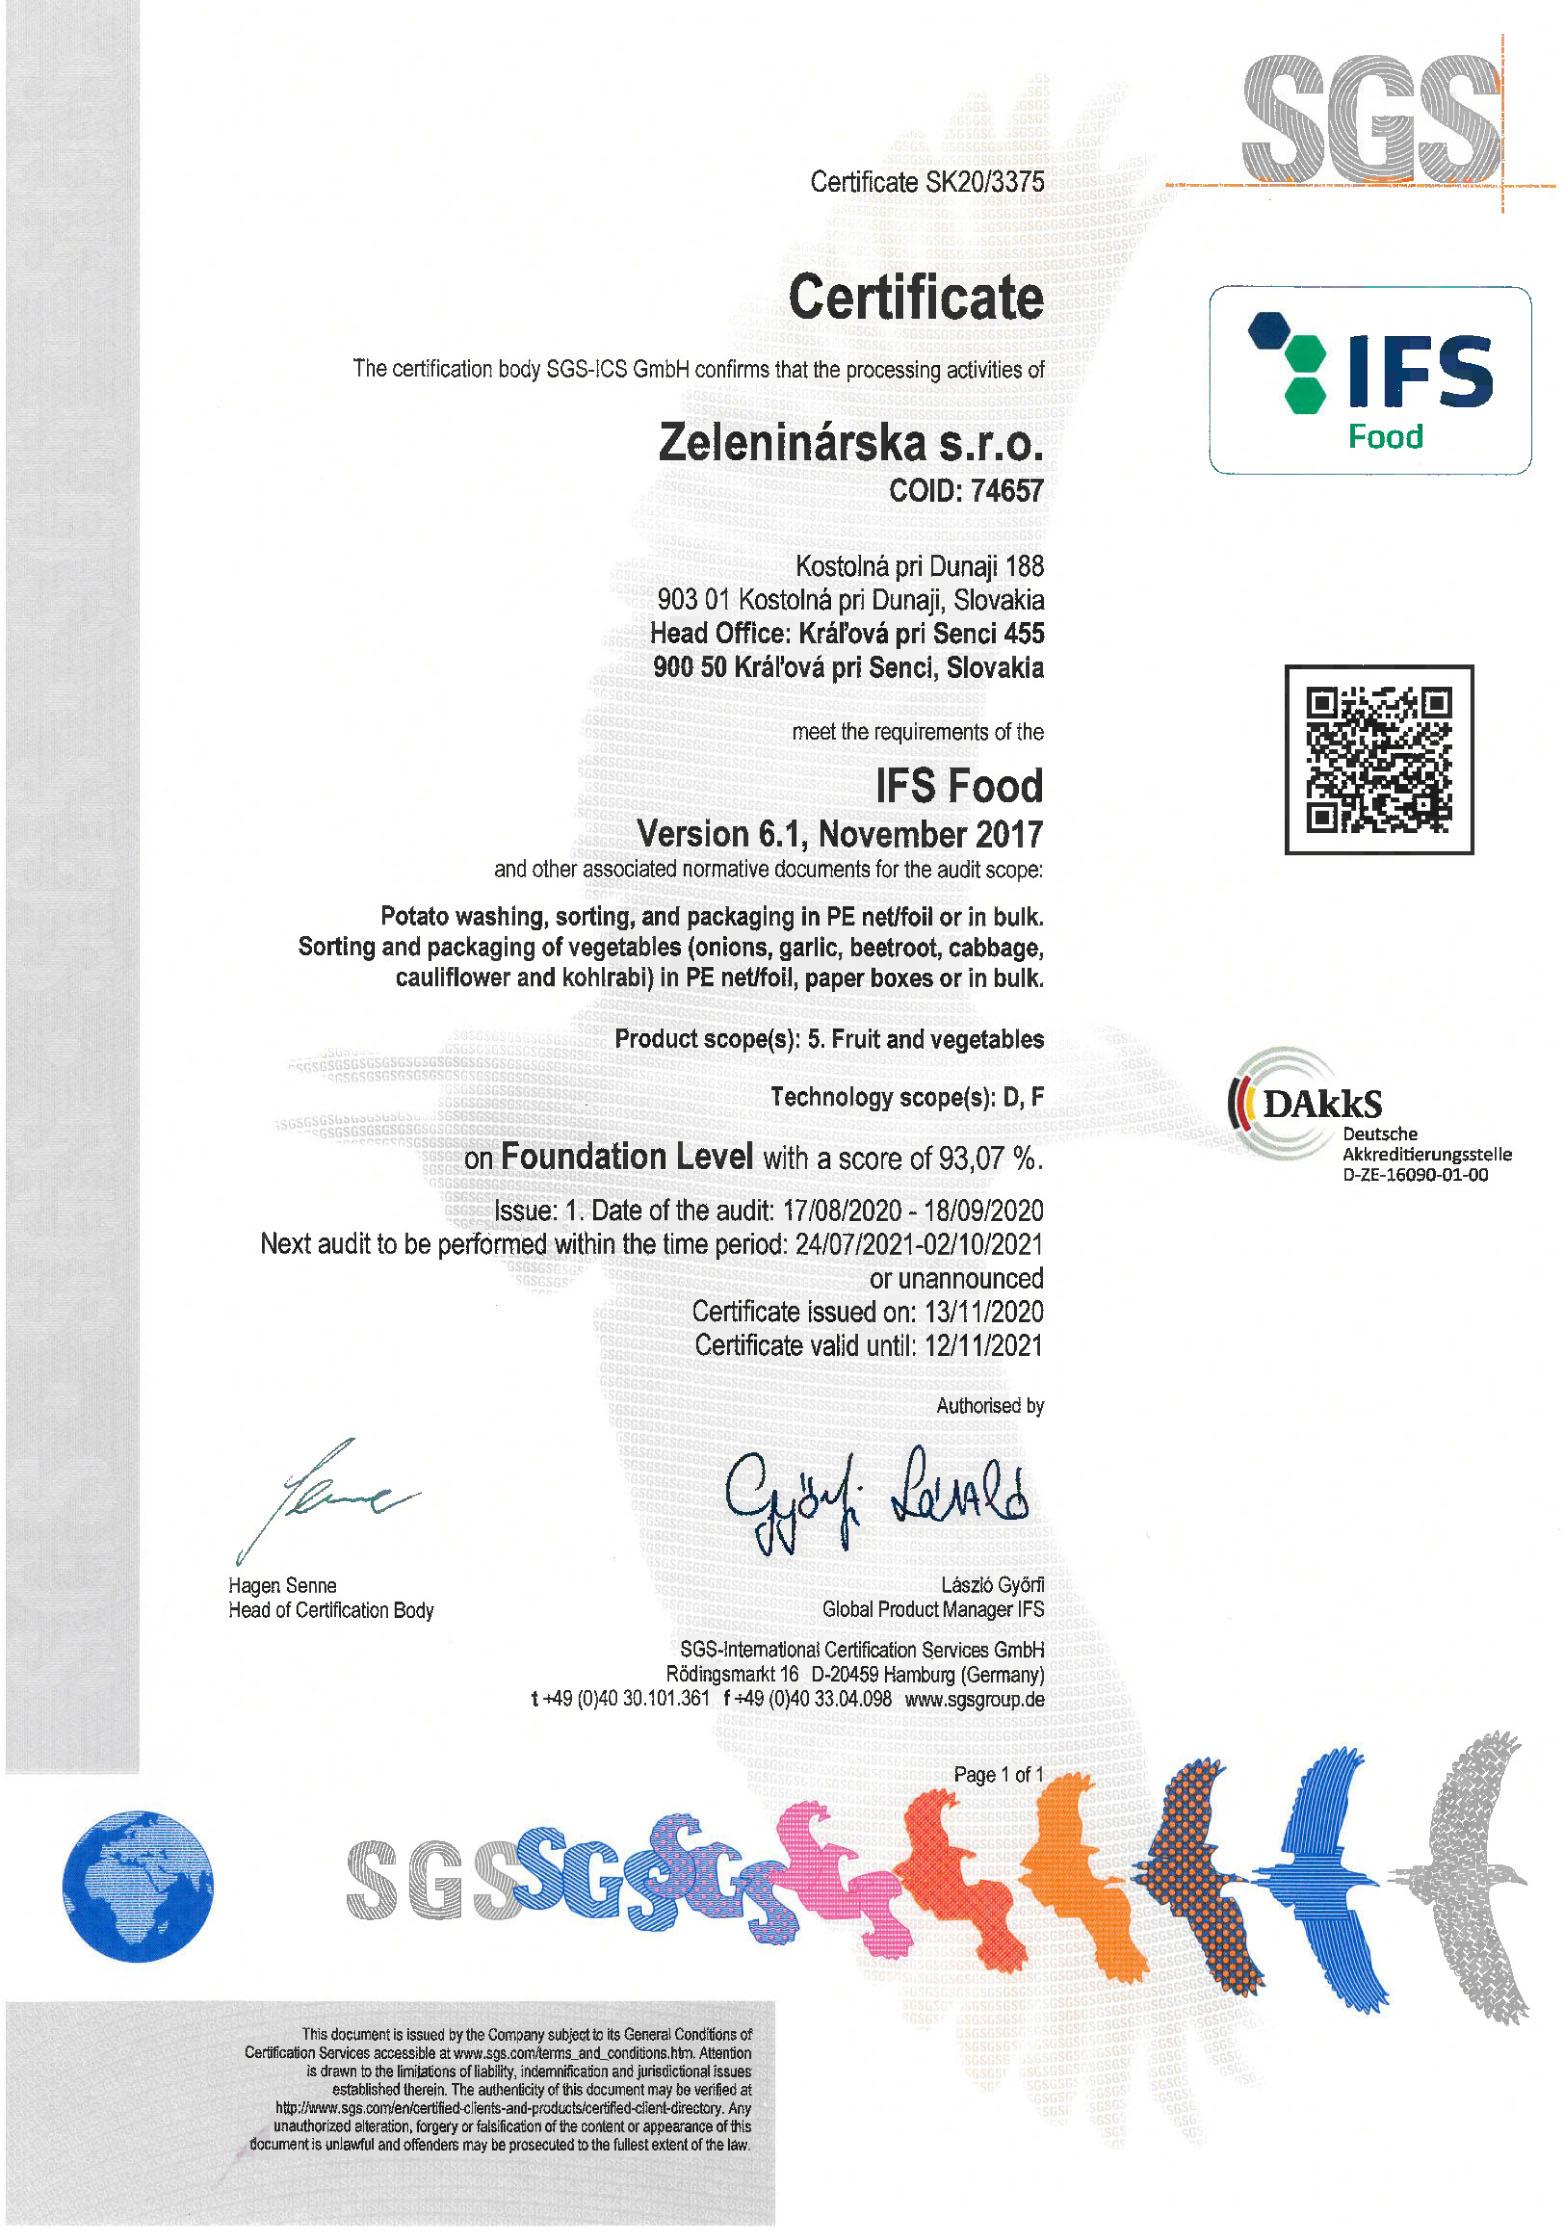 certifikat-IFS-Food-Zeleninarska